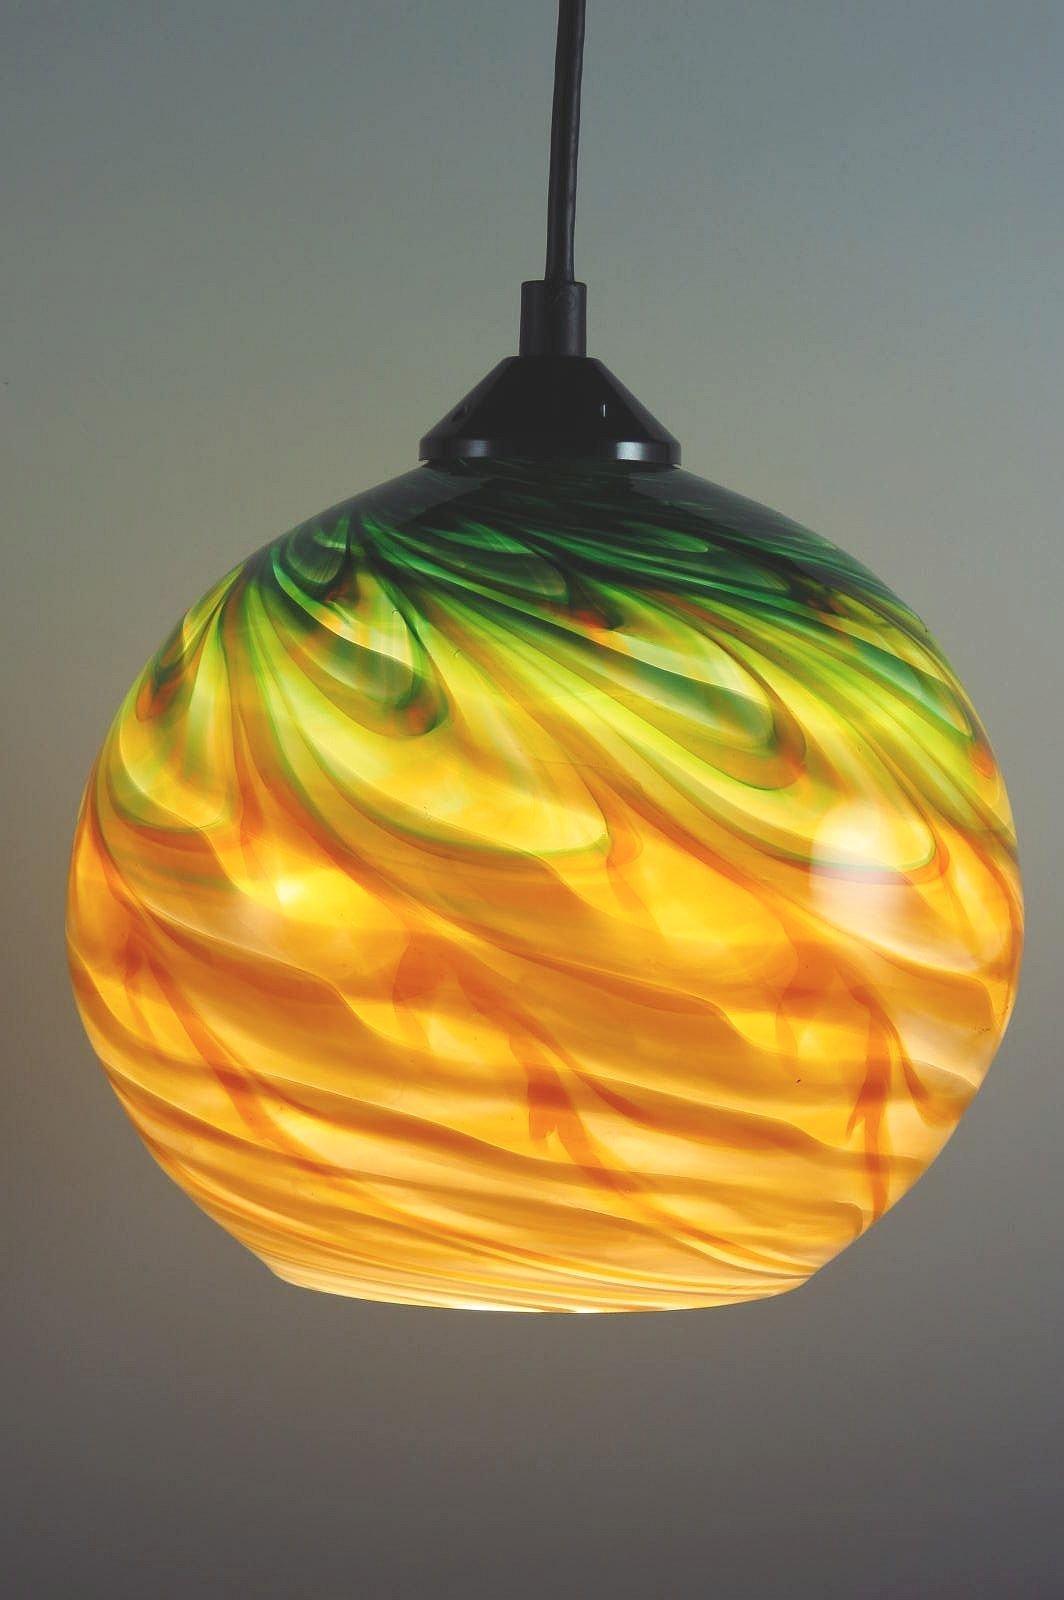 Gold And Green Optic Globe Pendant By Mark Rosenbaum Art